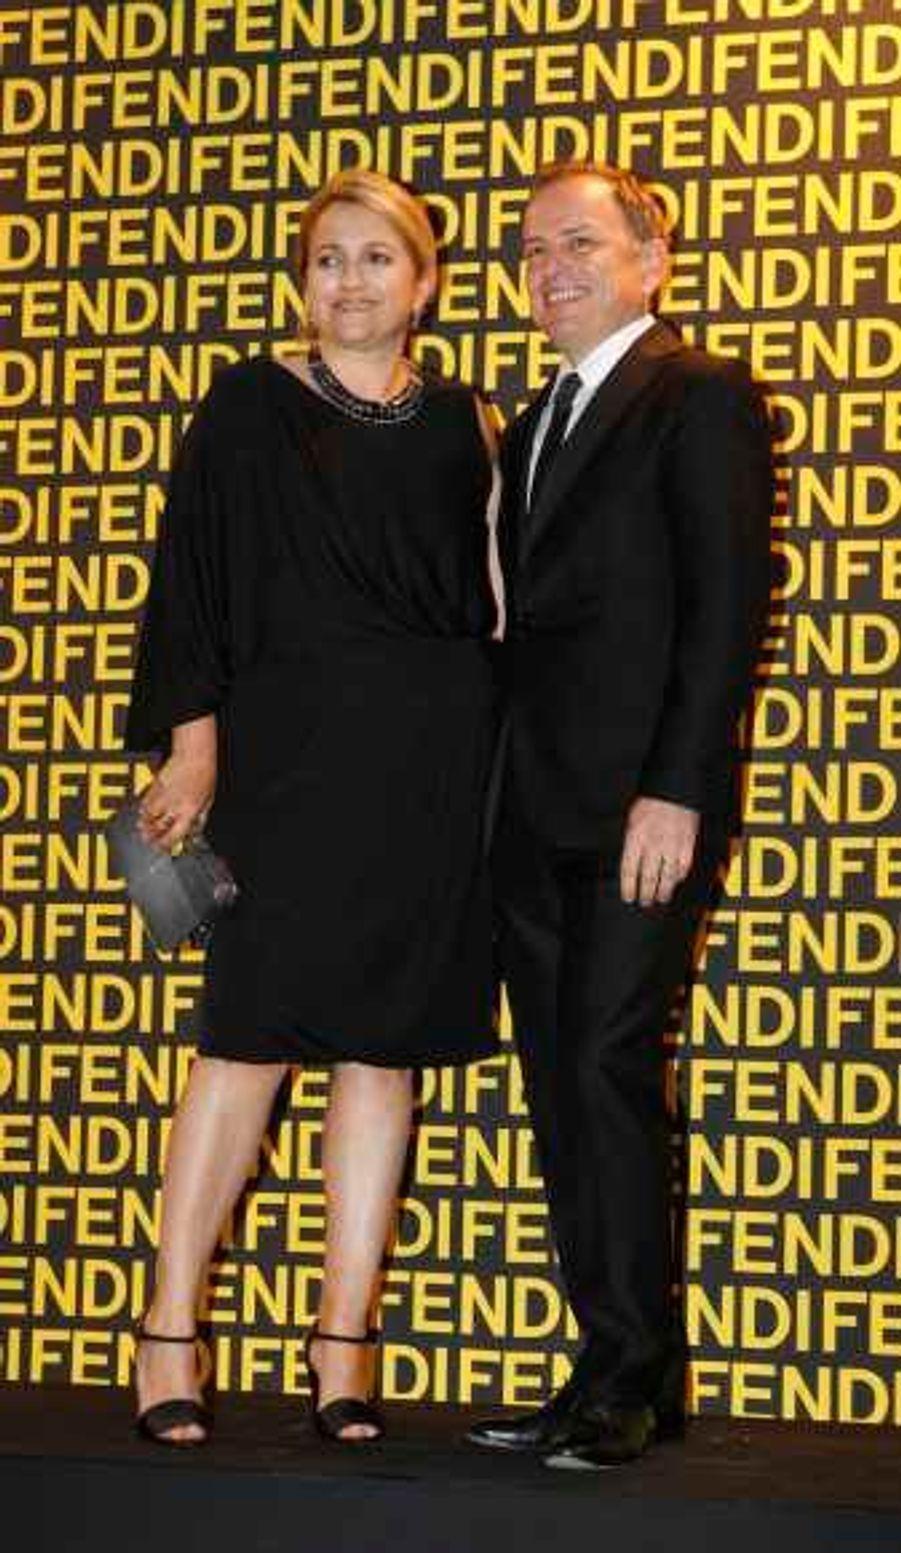 La directrice artistique Silvia Fendi et Michael Burke